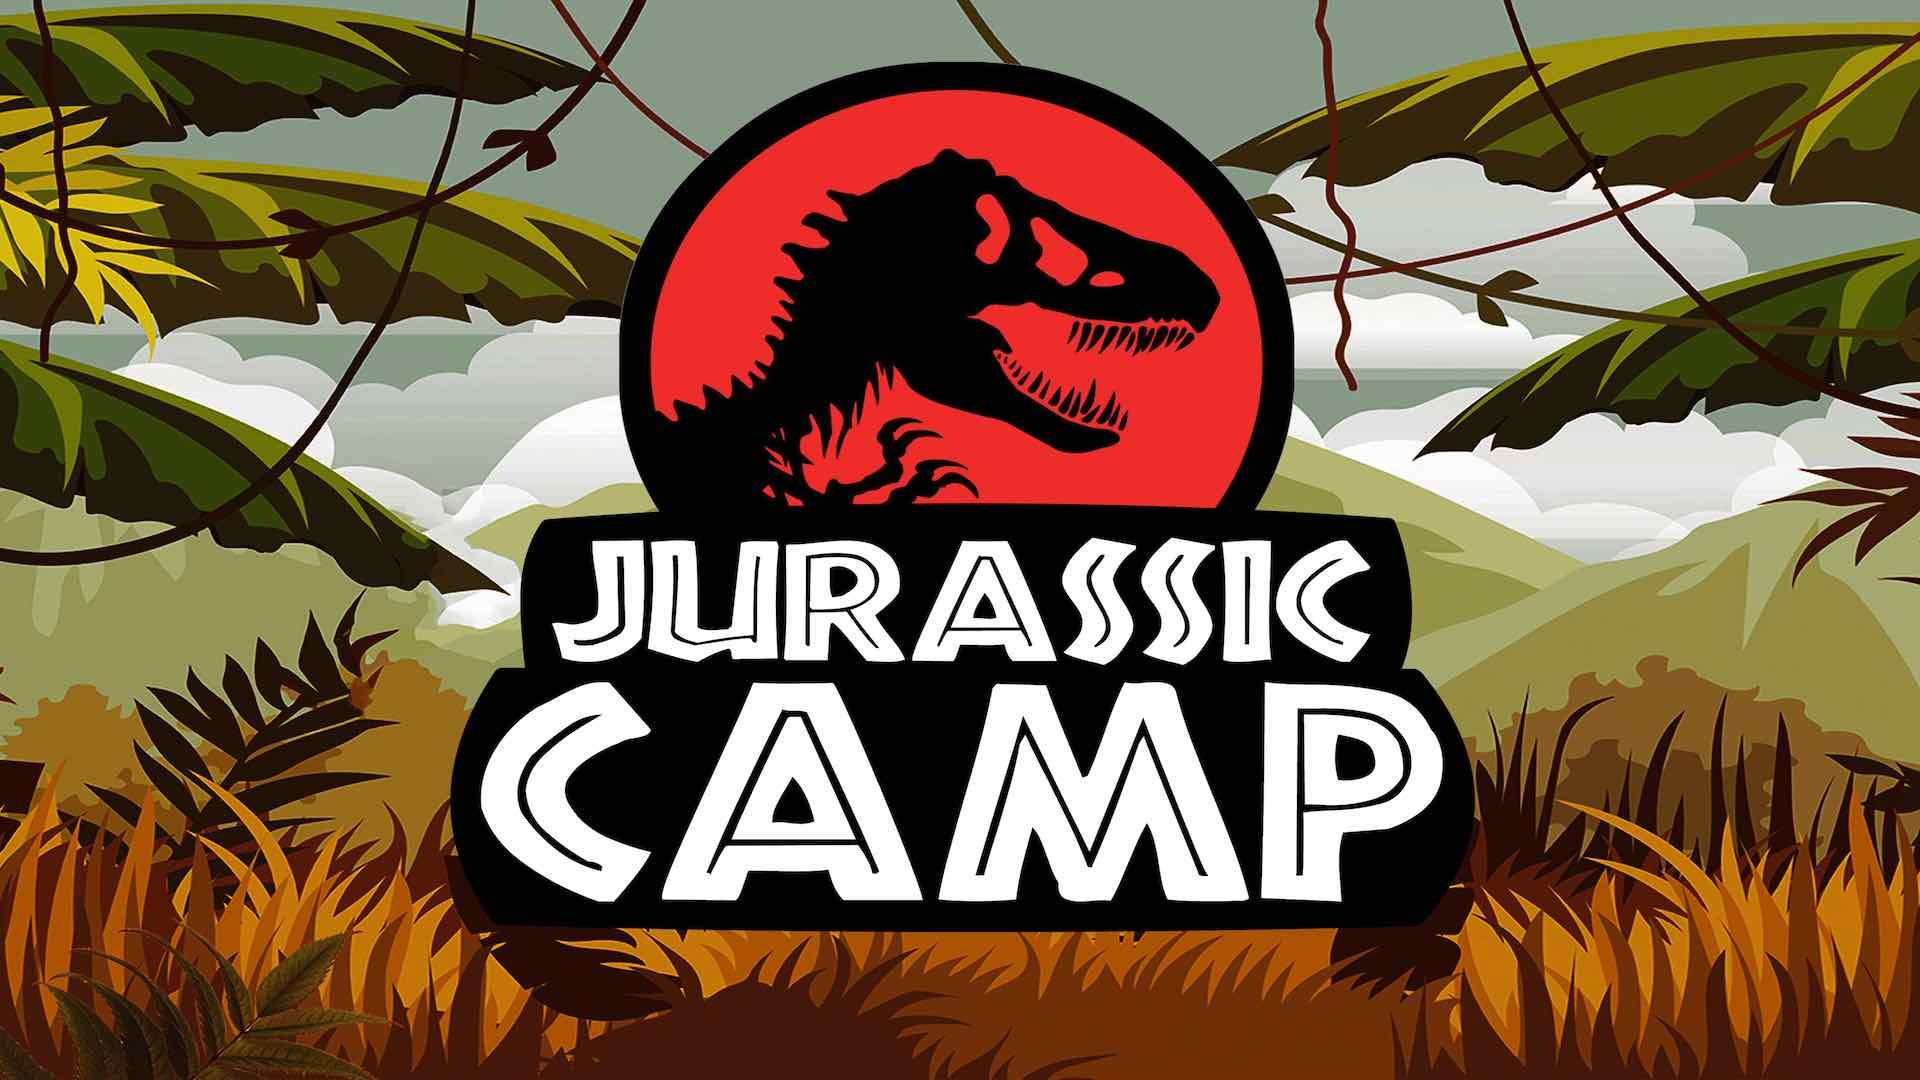 Jurassic camp web